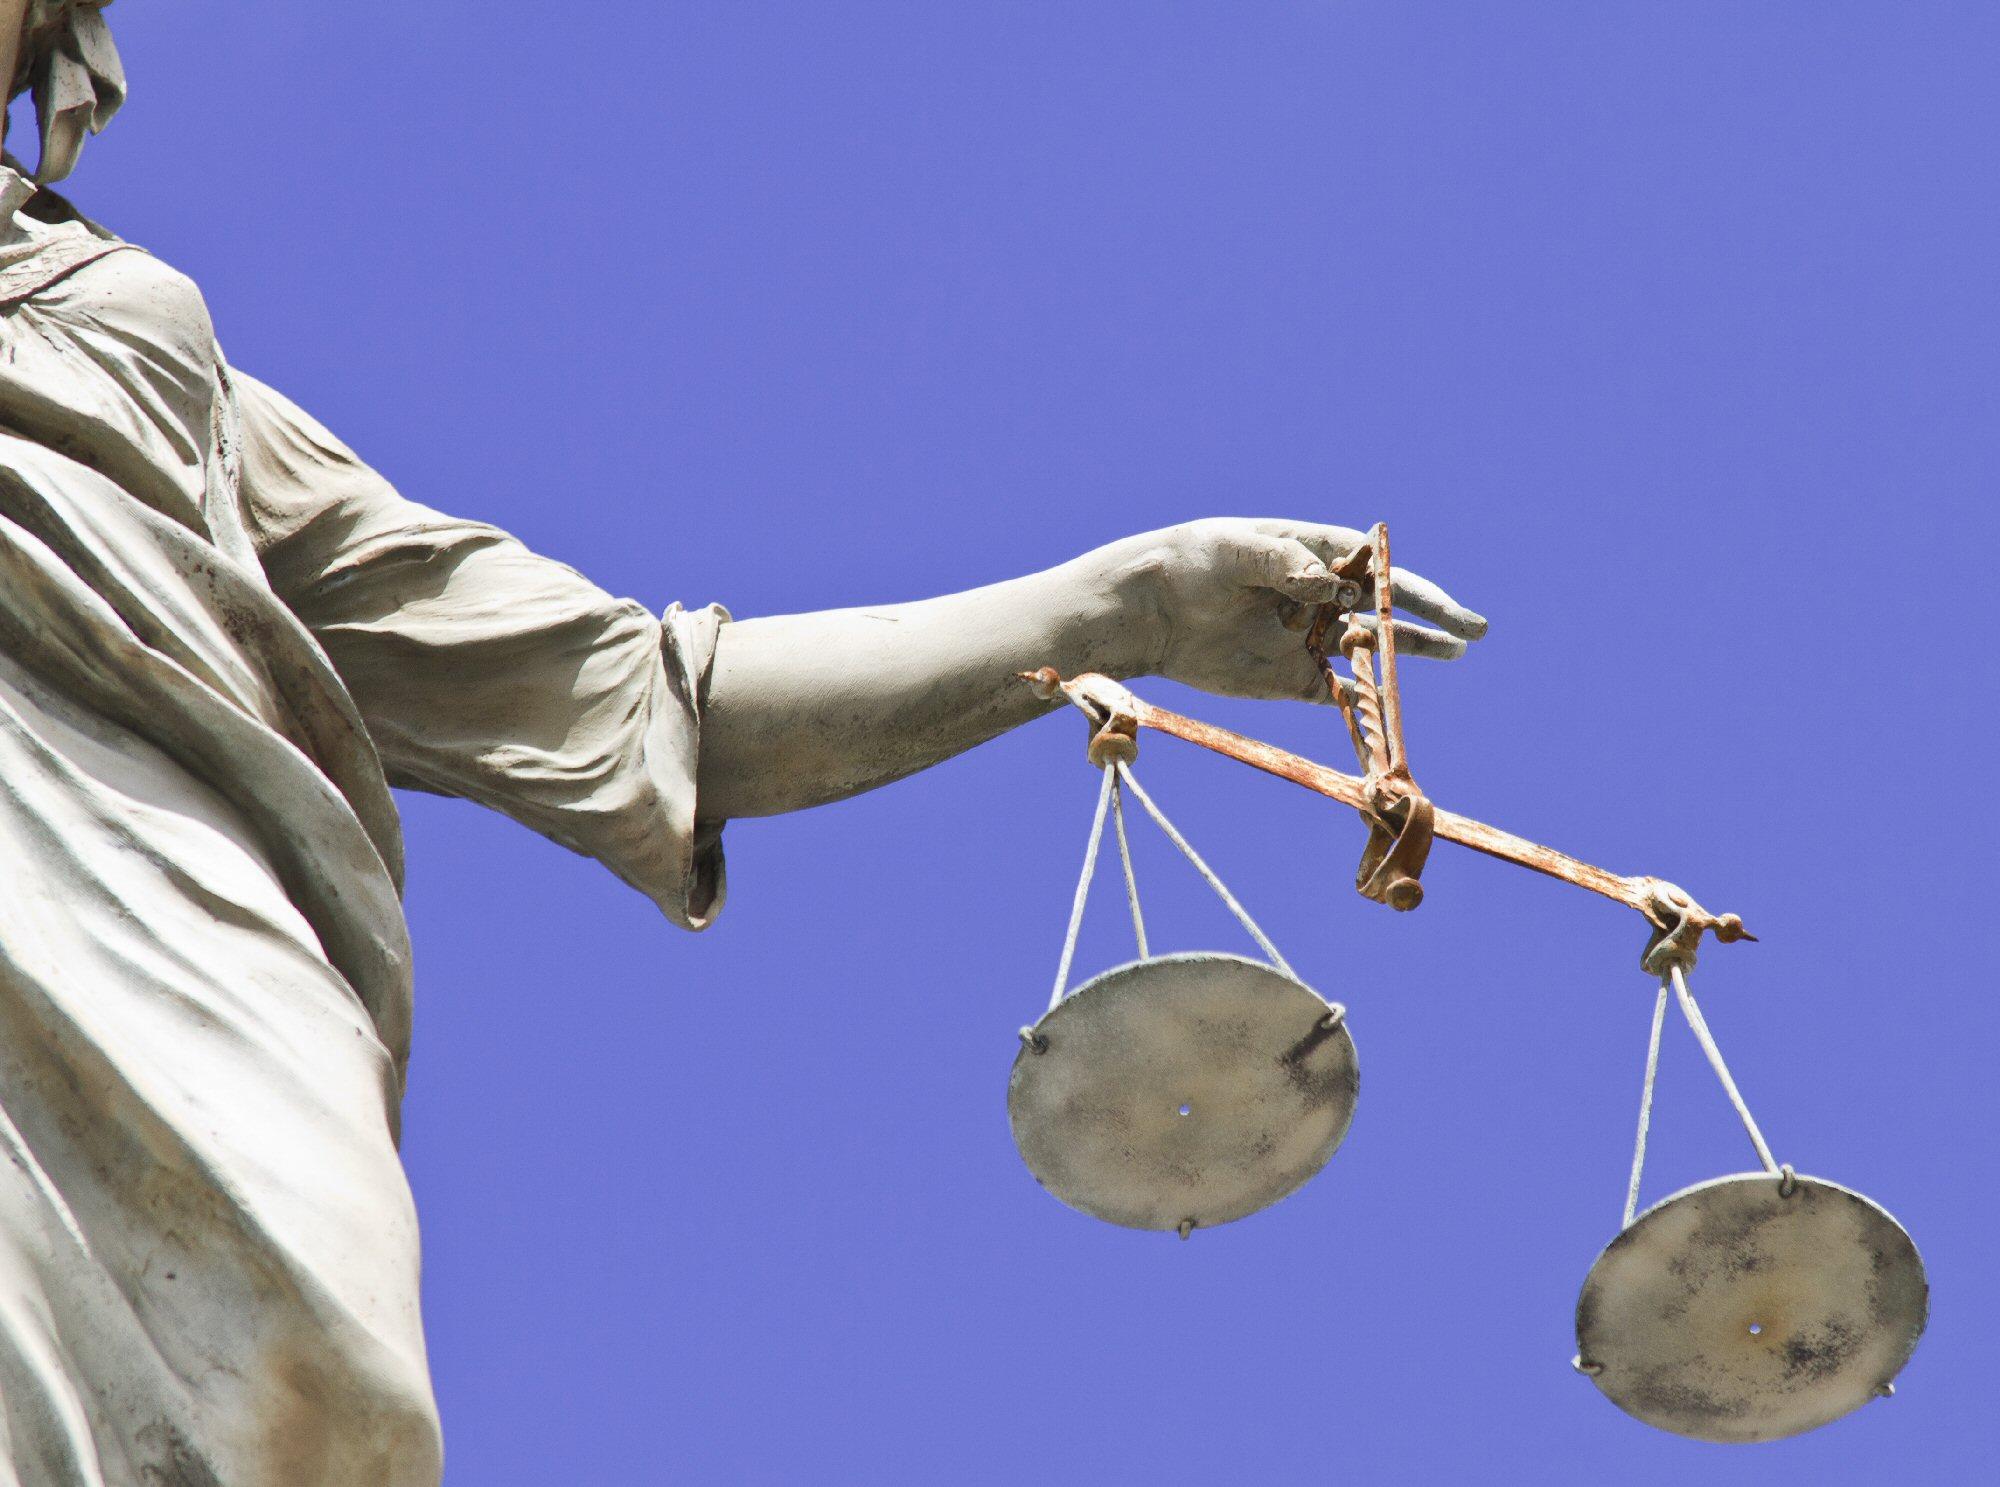 Tribunale di Lucca n.2239 del 12/12/2017